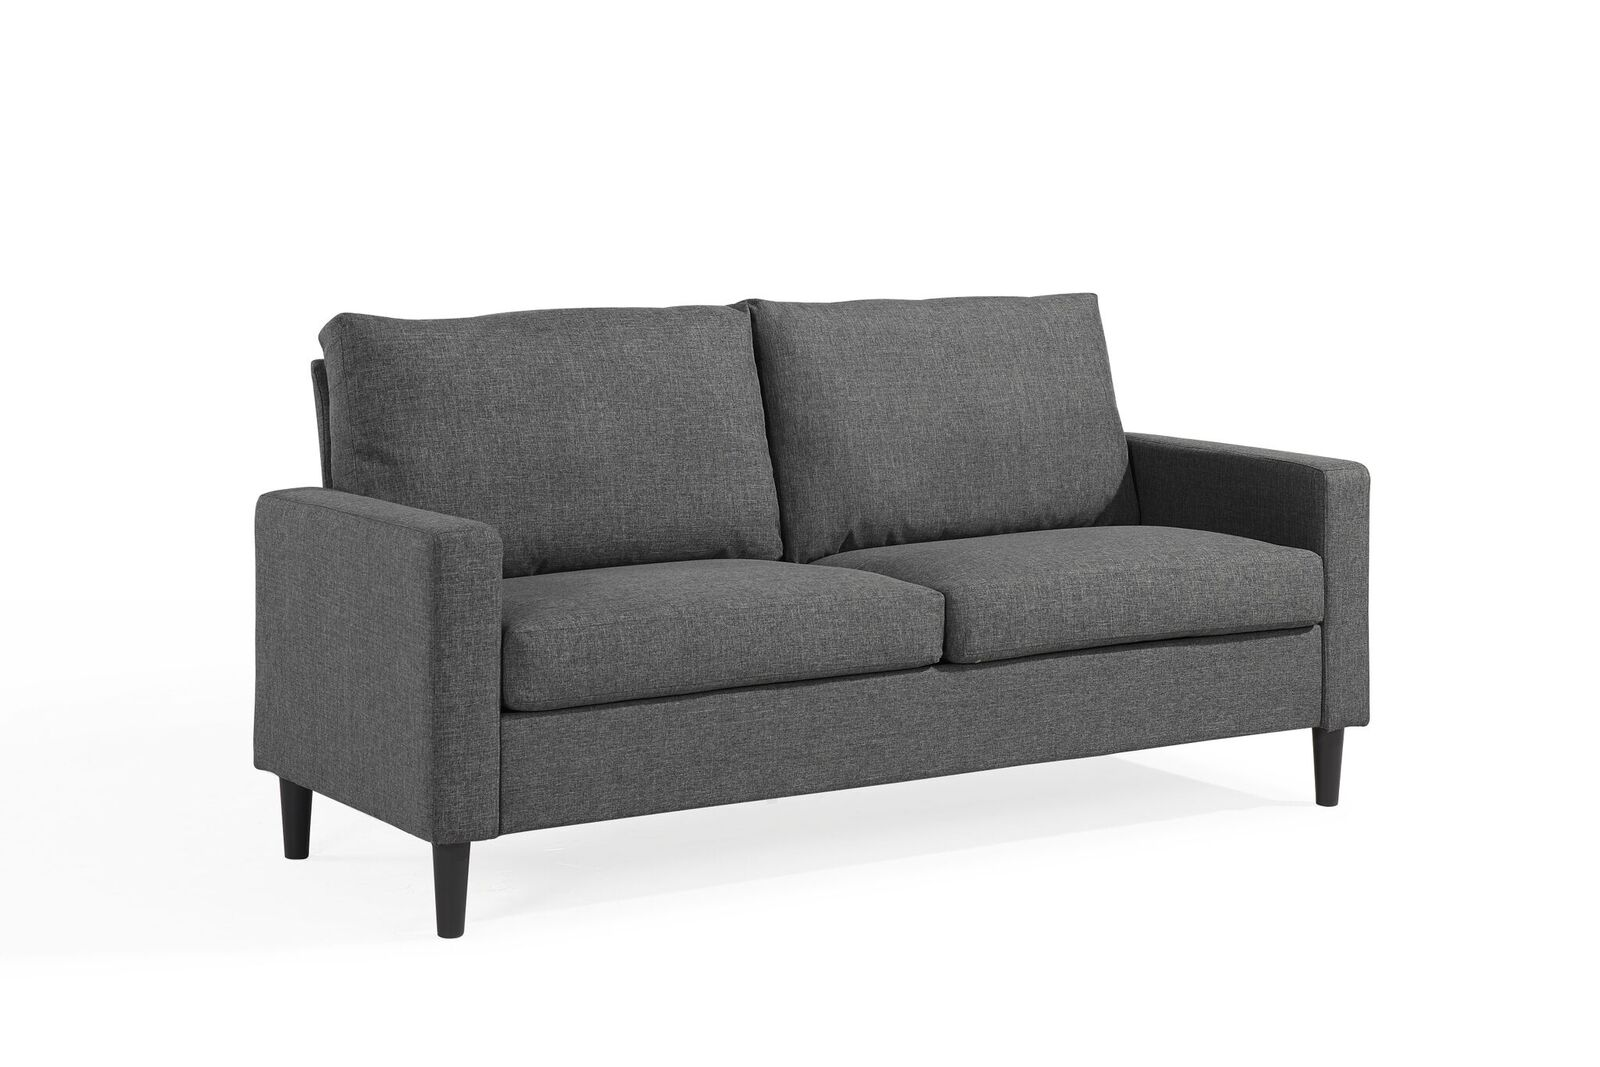 Mainstays Apartment Sofa Assembly Instructions Baci